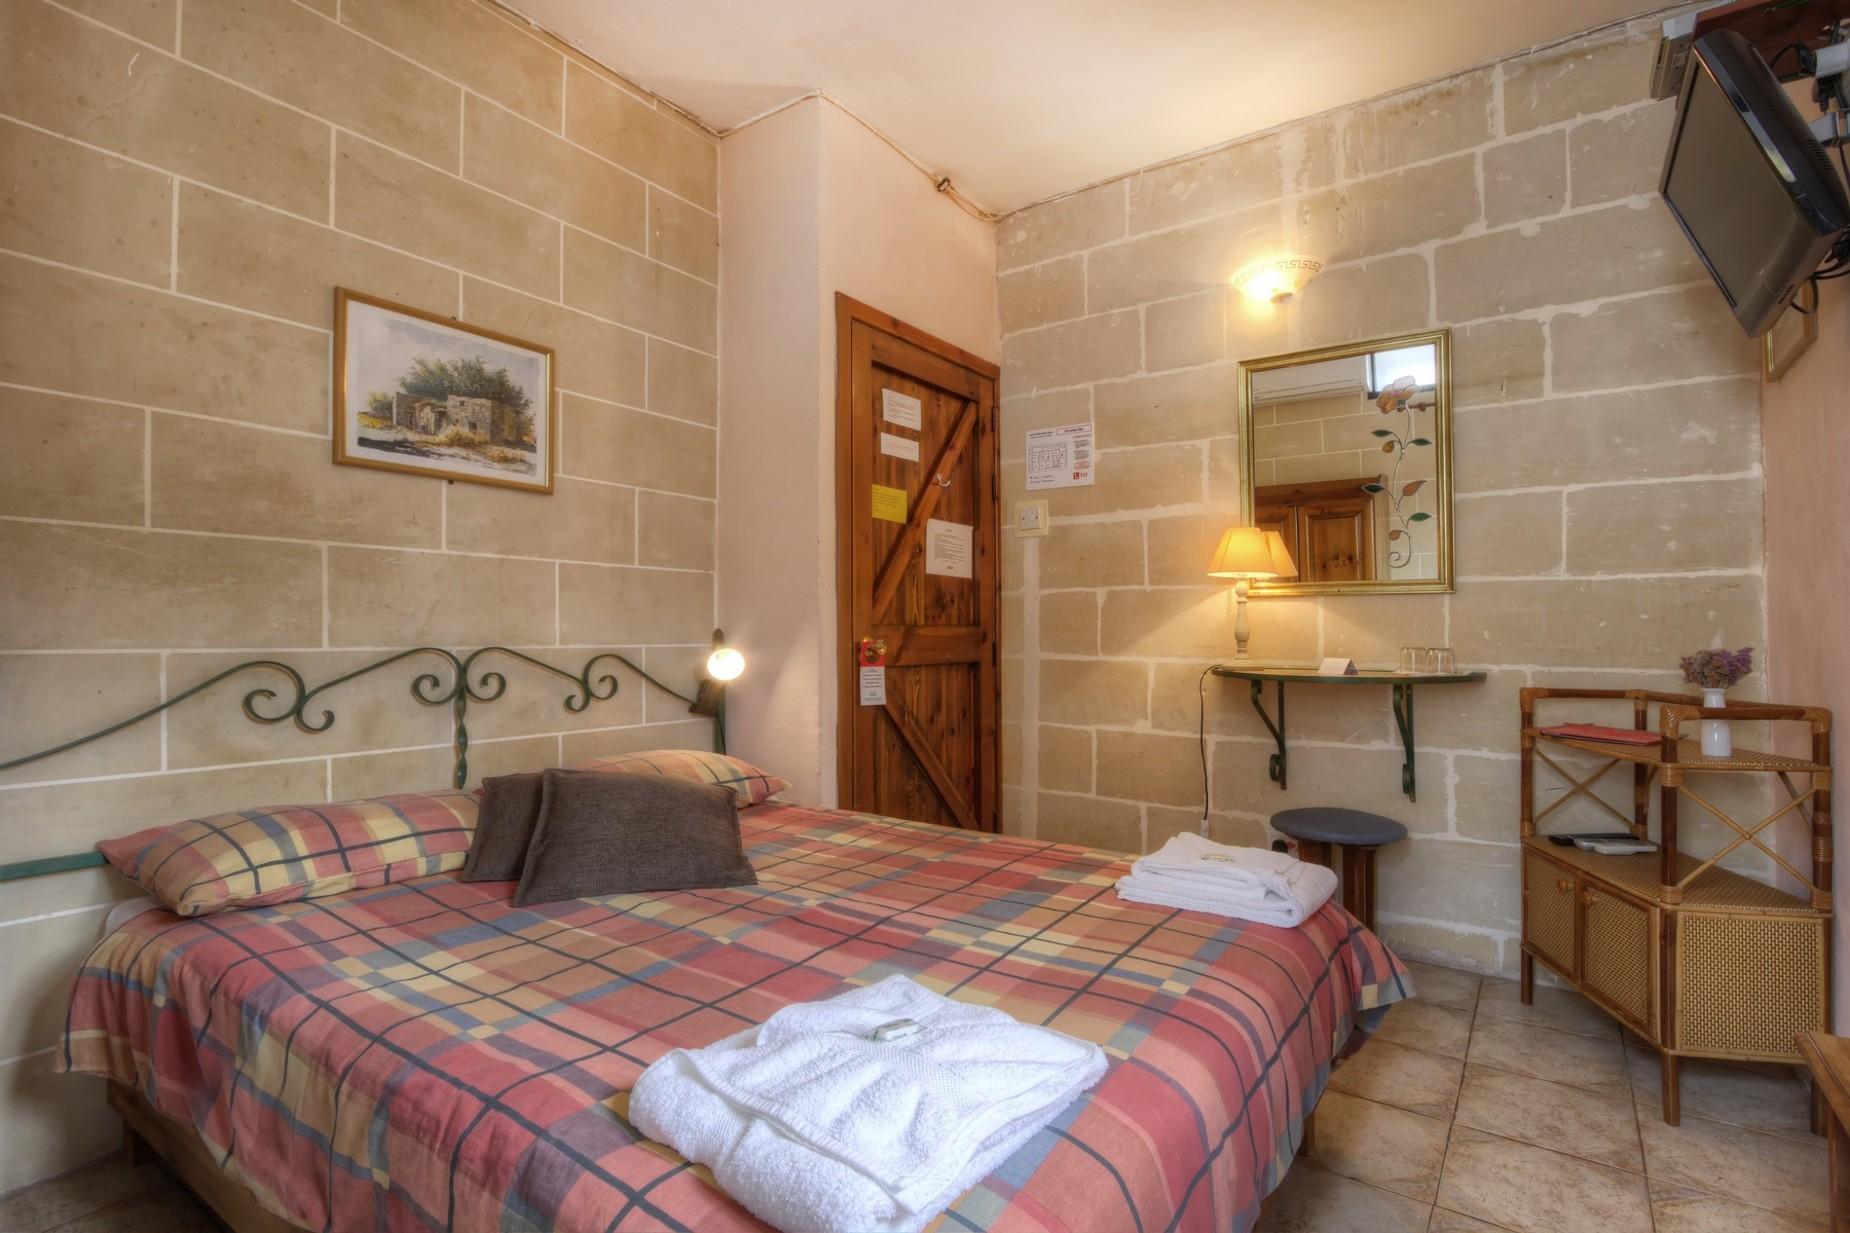 0 bed Hotel For Rent in Swieqi, Swieqi - thumb 4